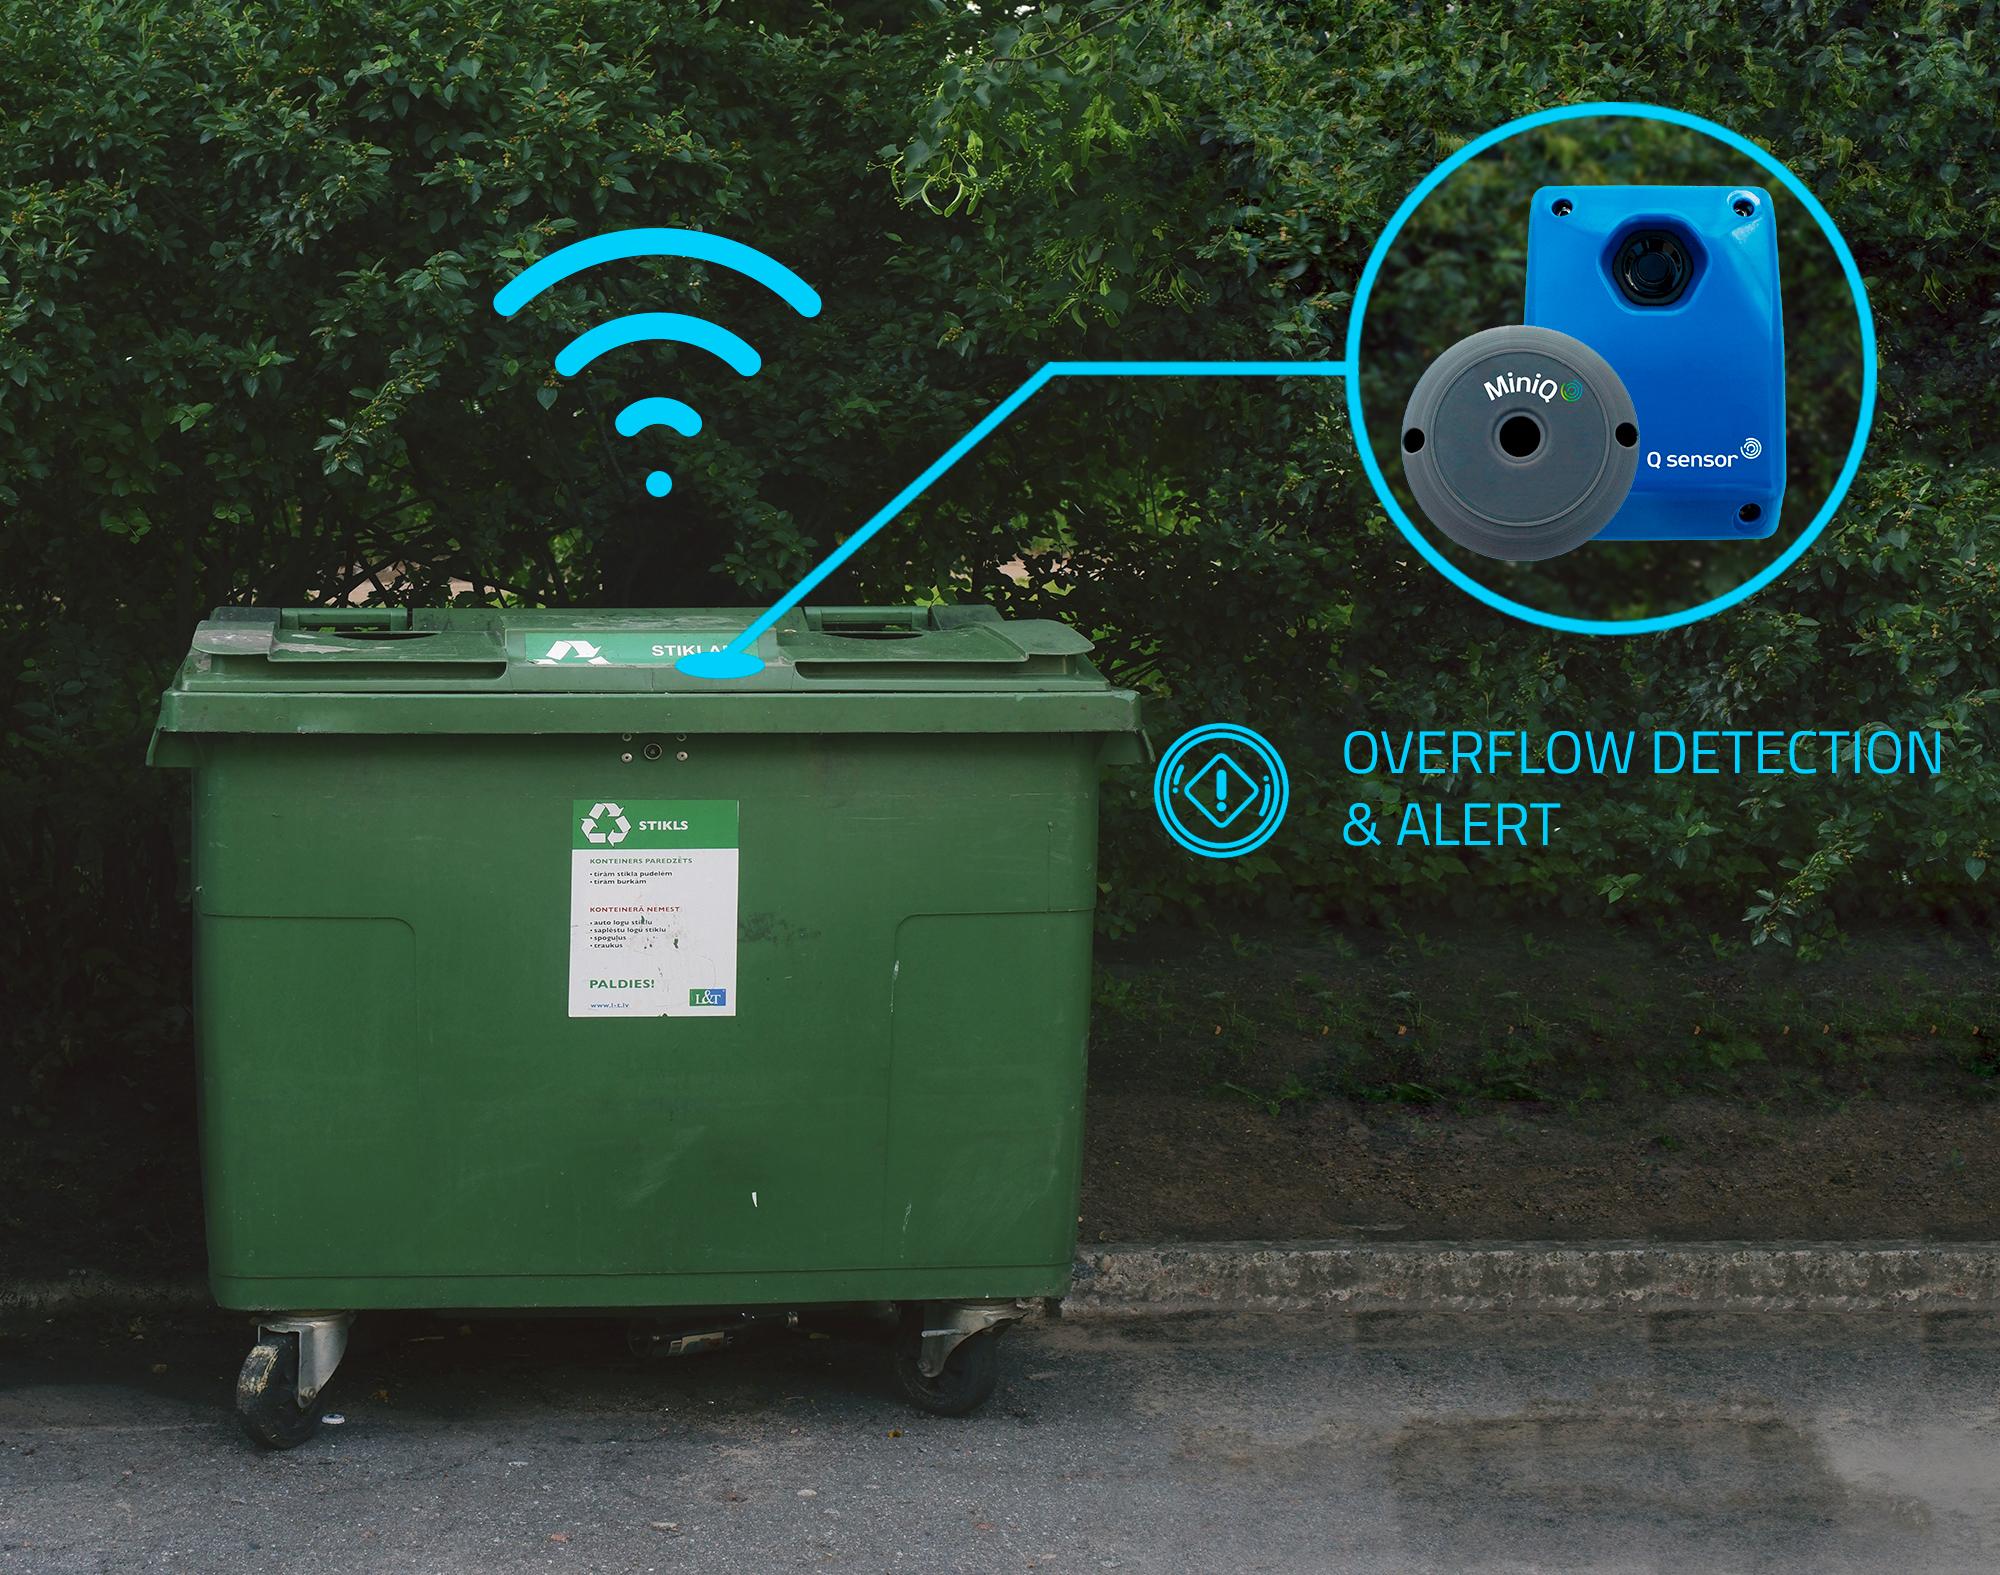 Quamtra Smart Waste Management